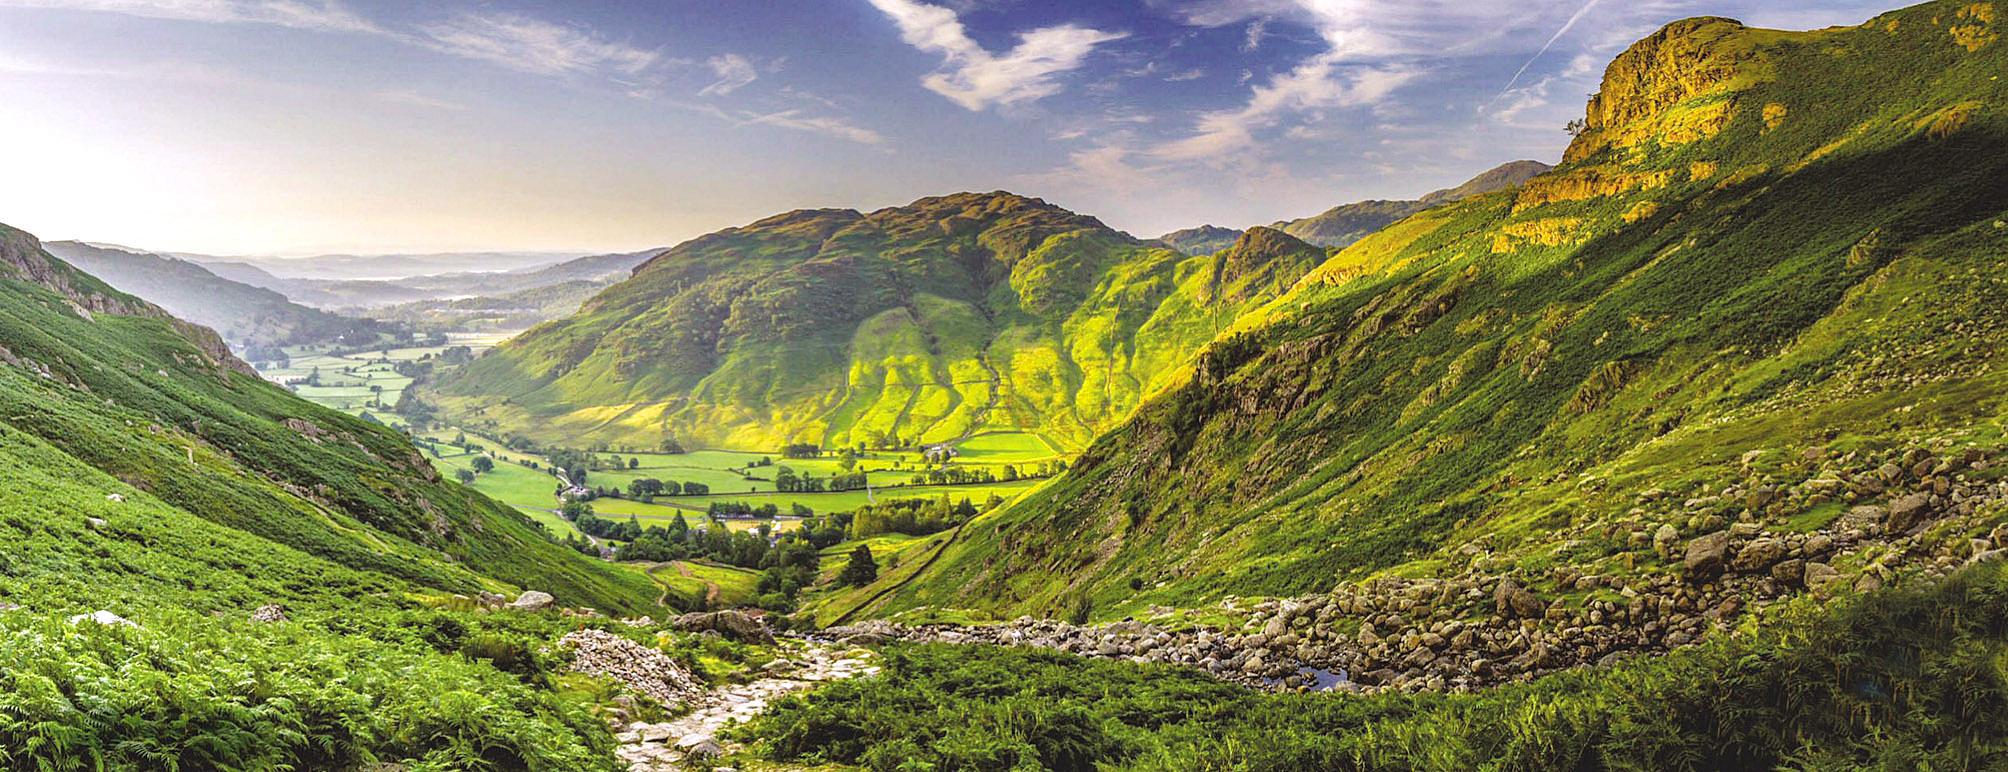 Great Langdale, Lake District.jpg